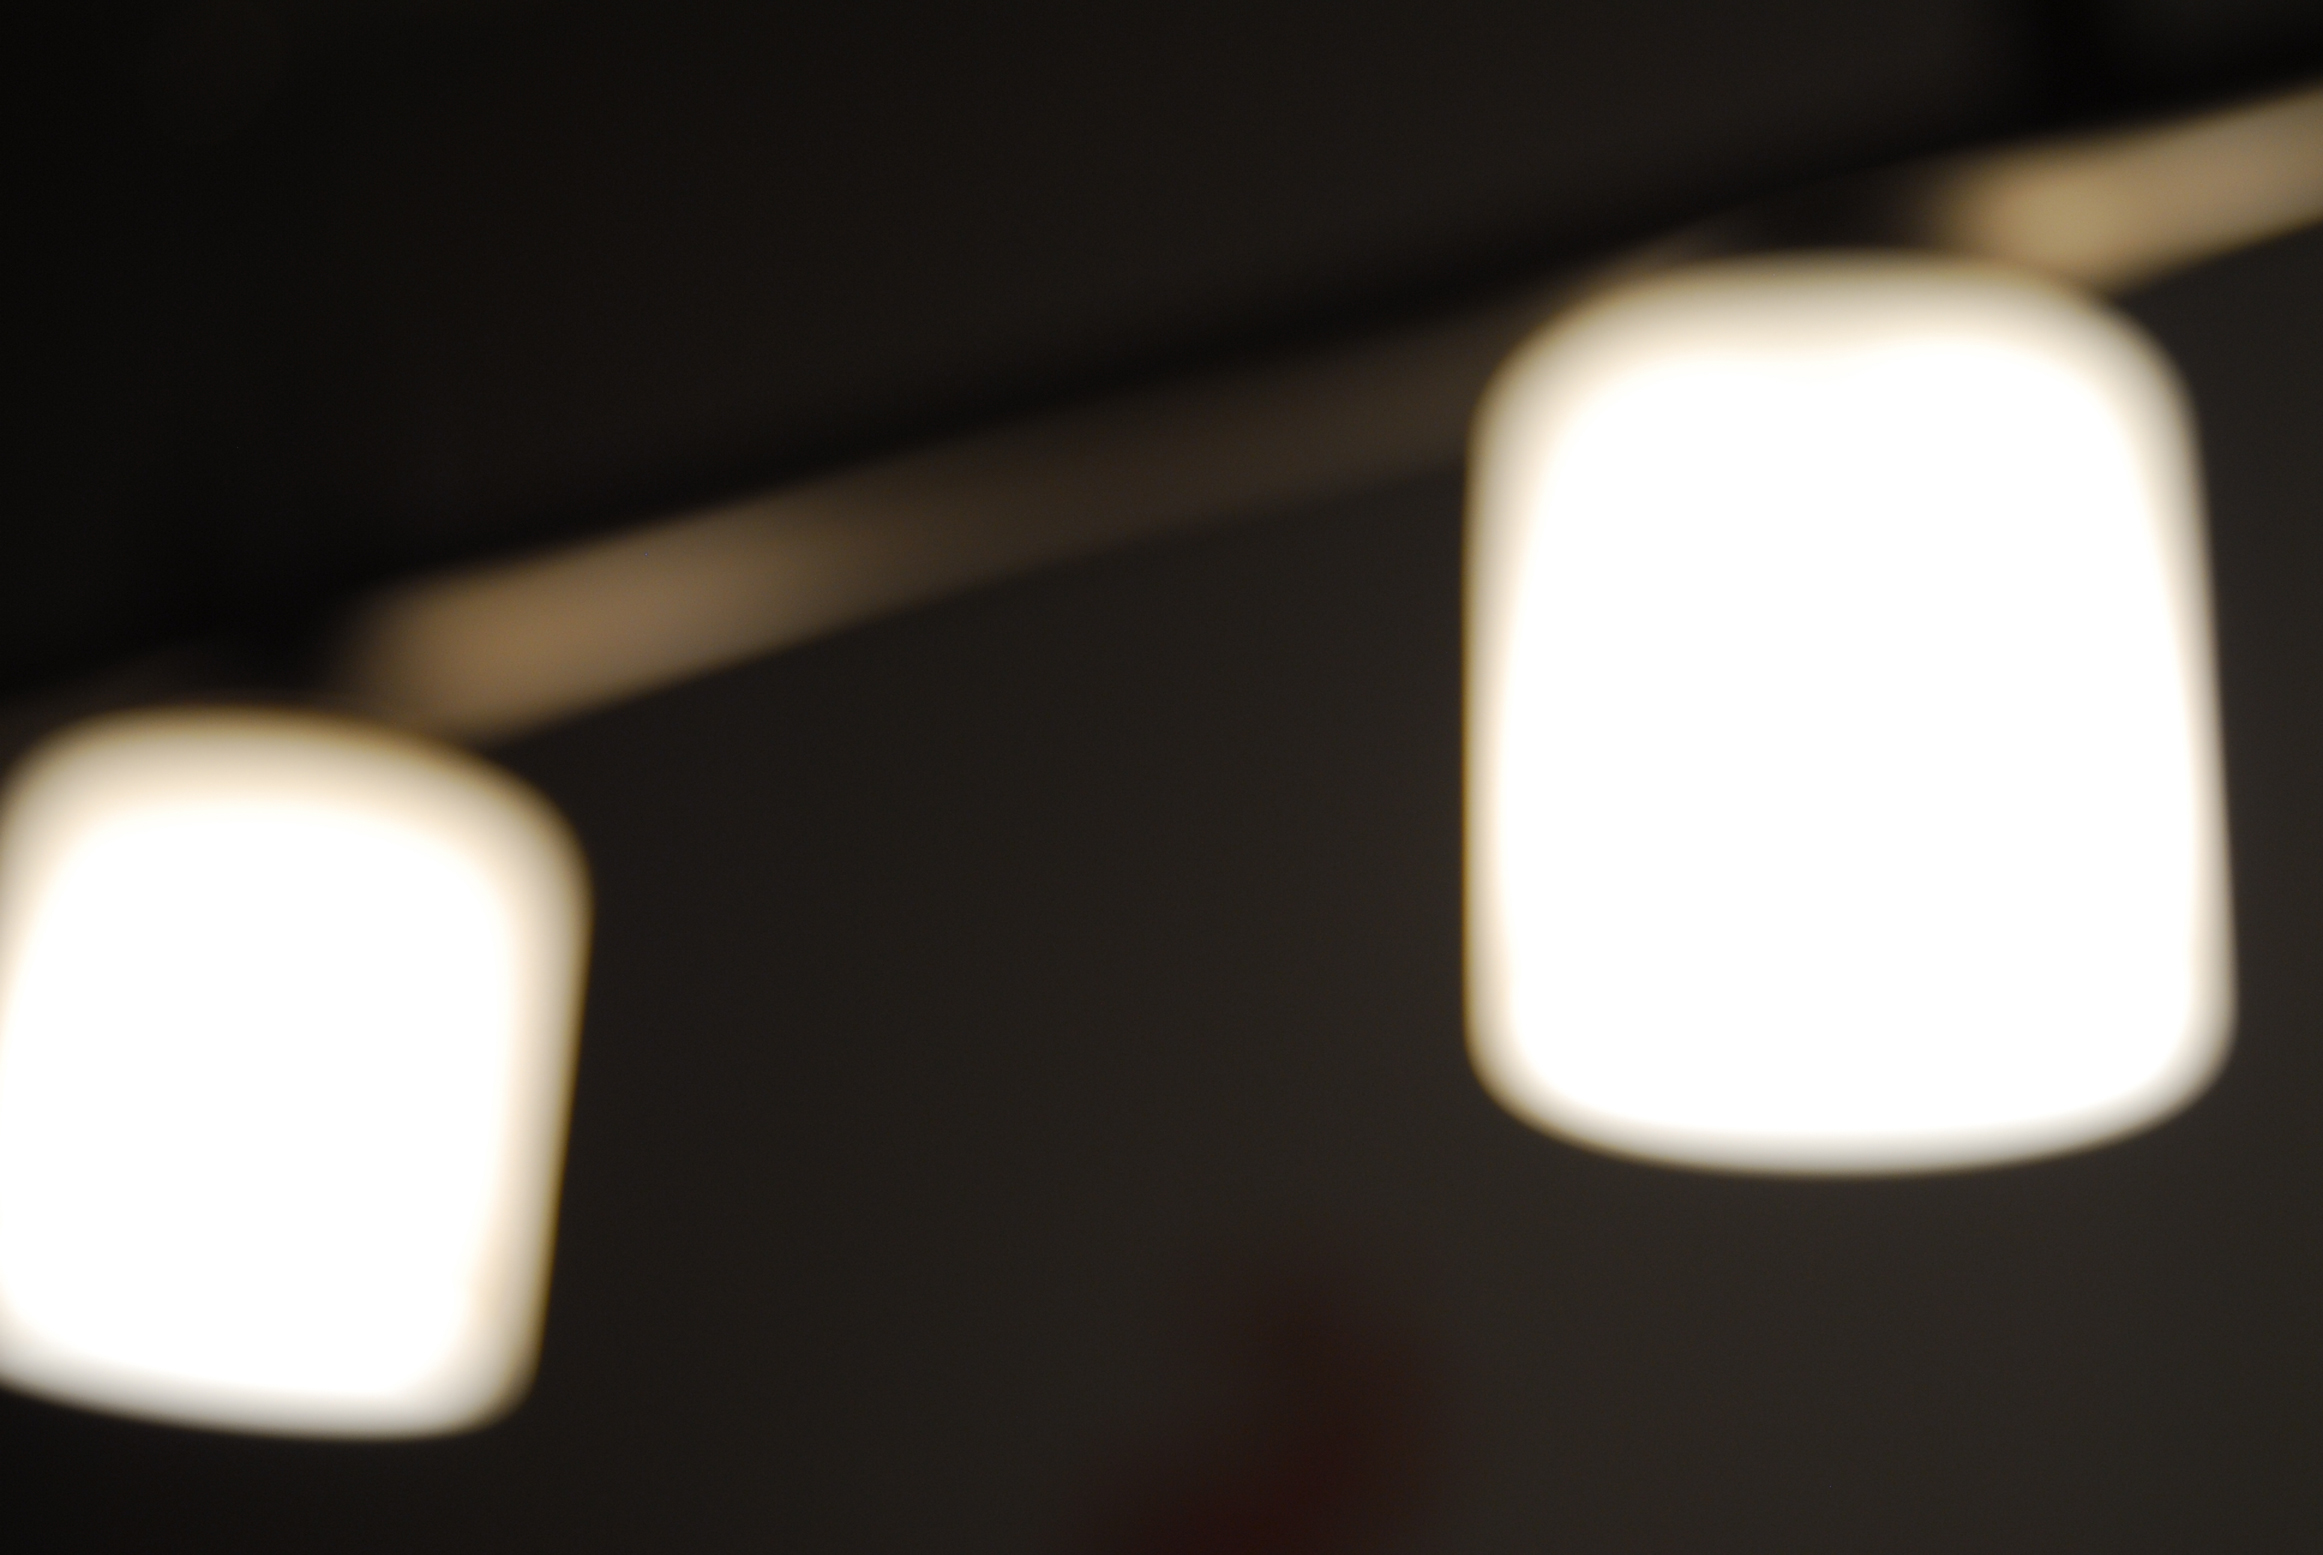 Lampe alternativ